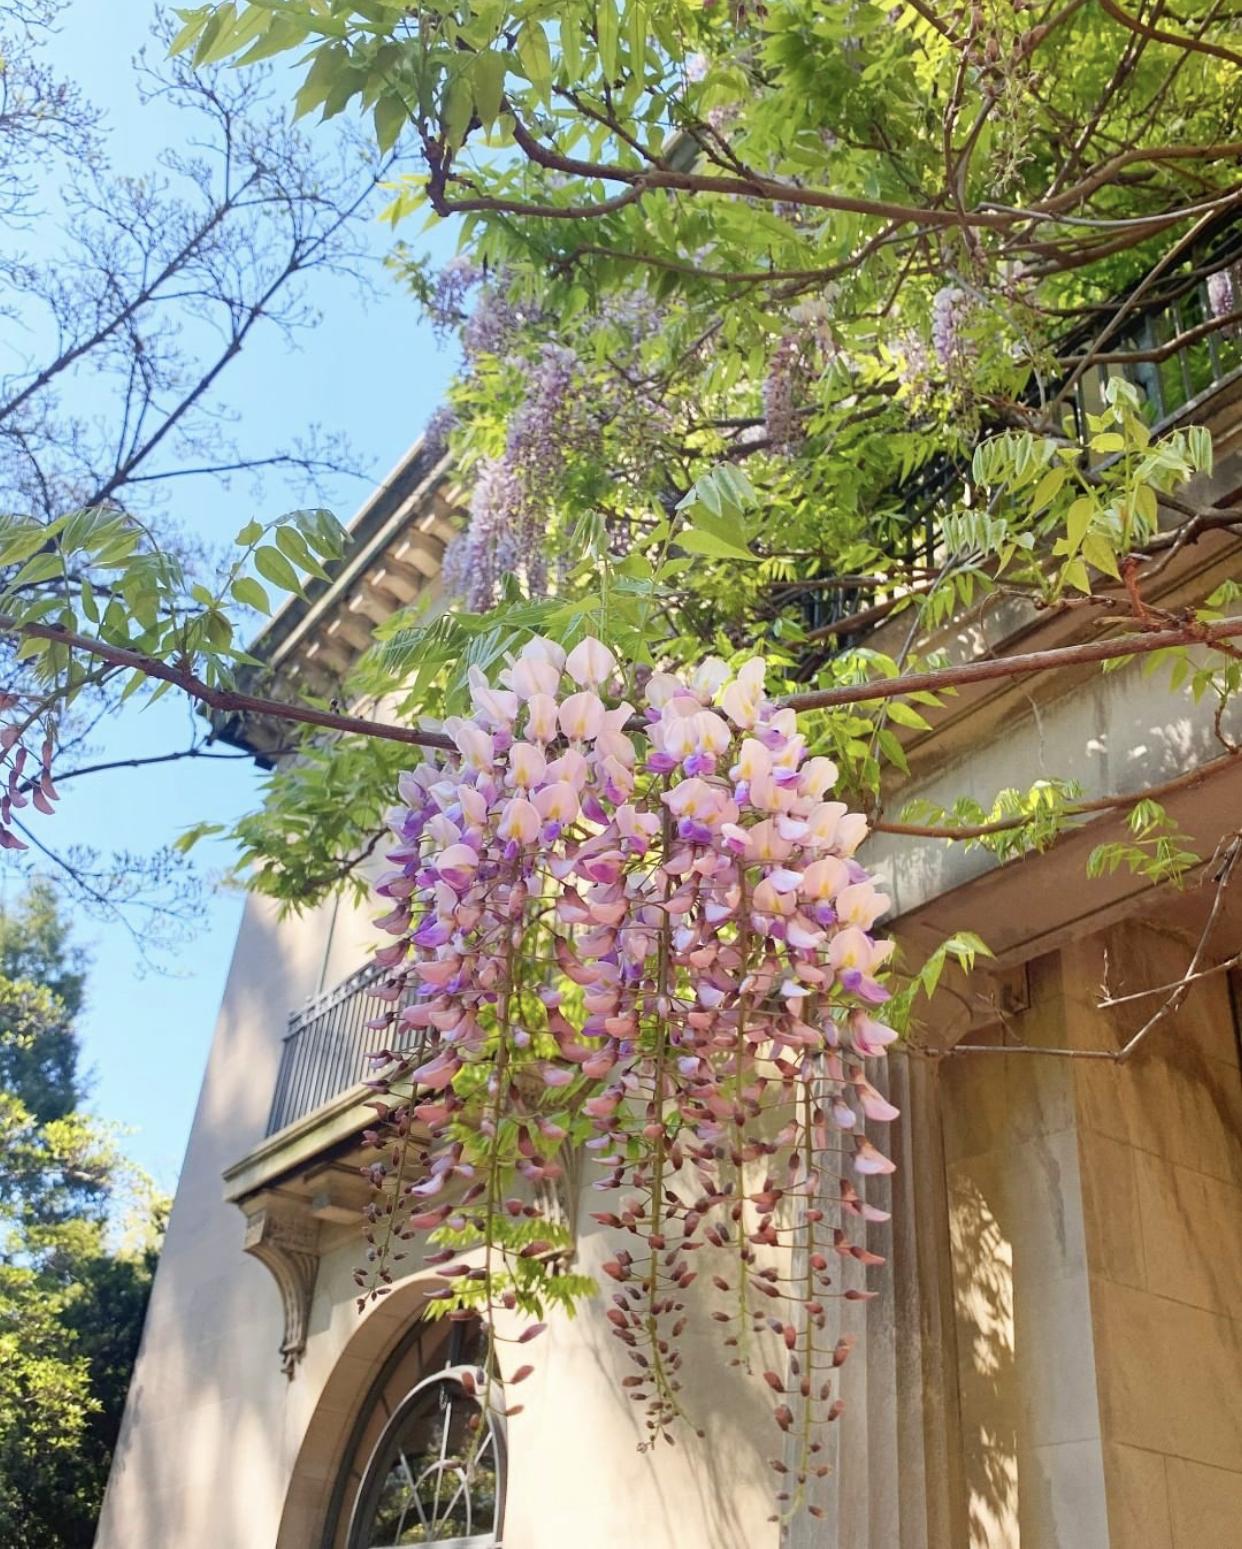 NJ gardens van vleck house and gardens